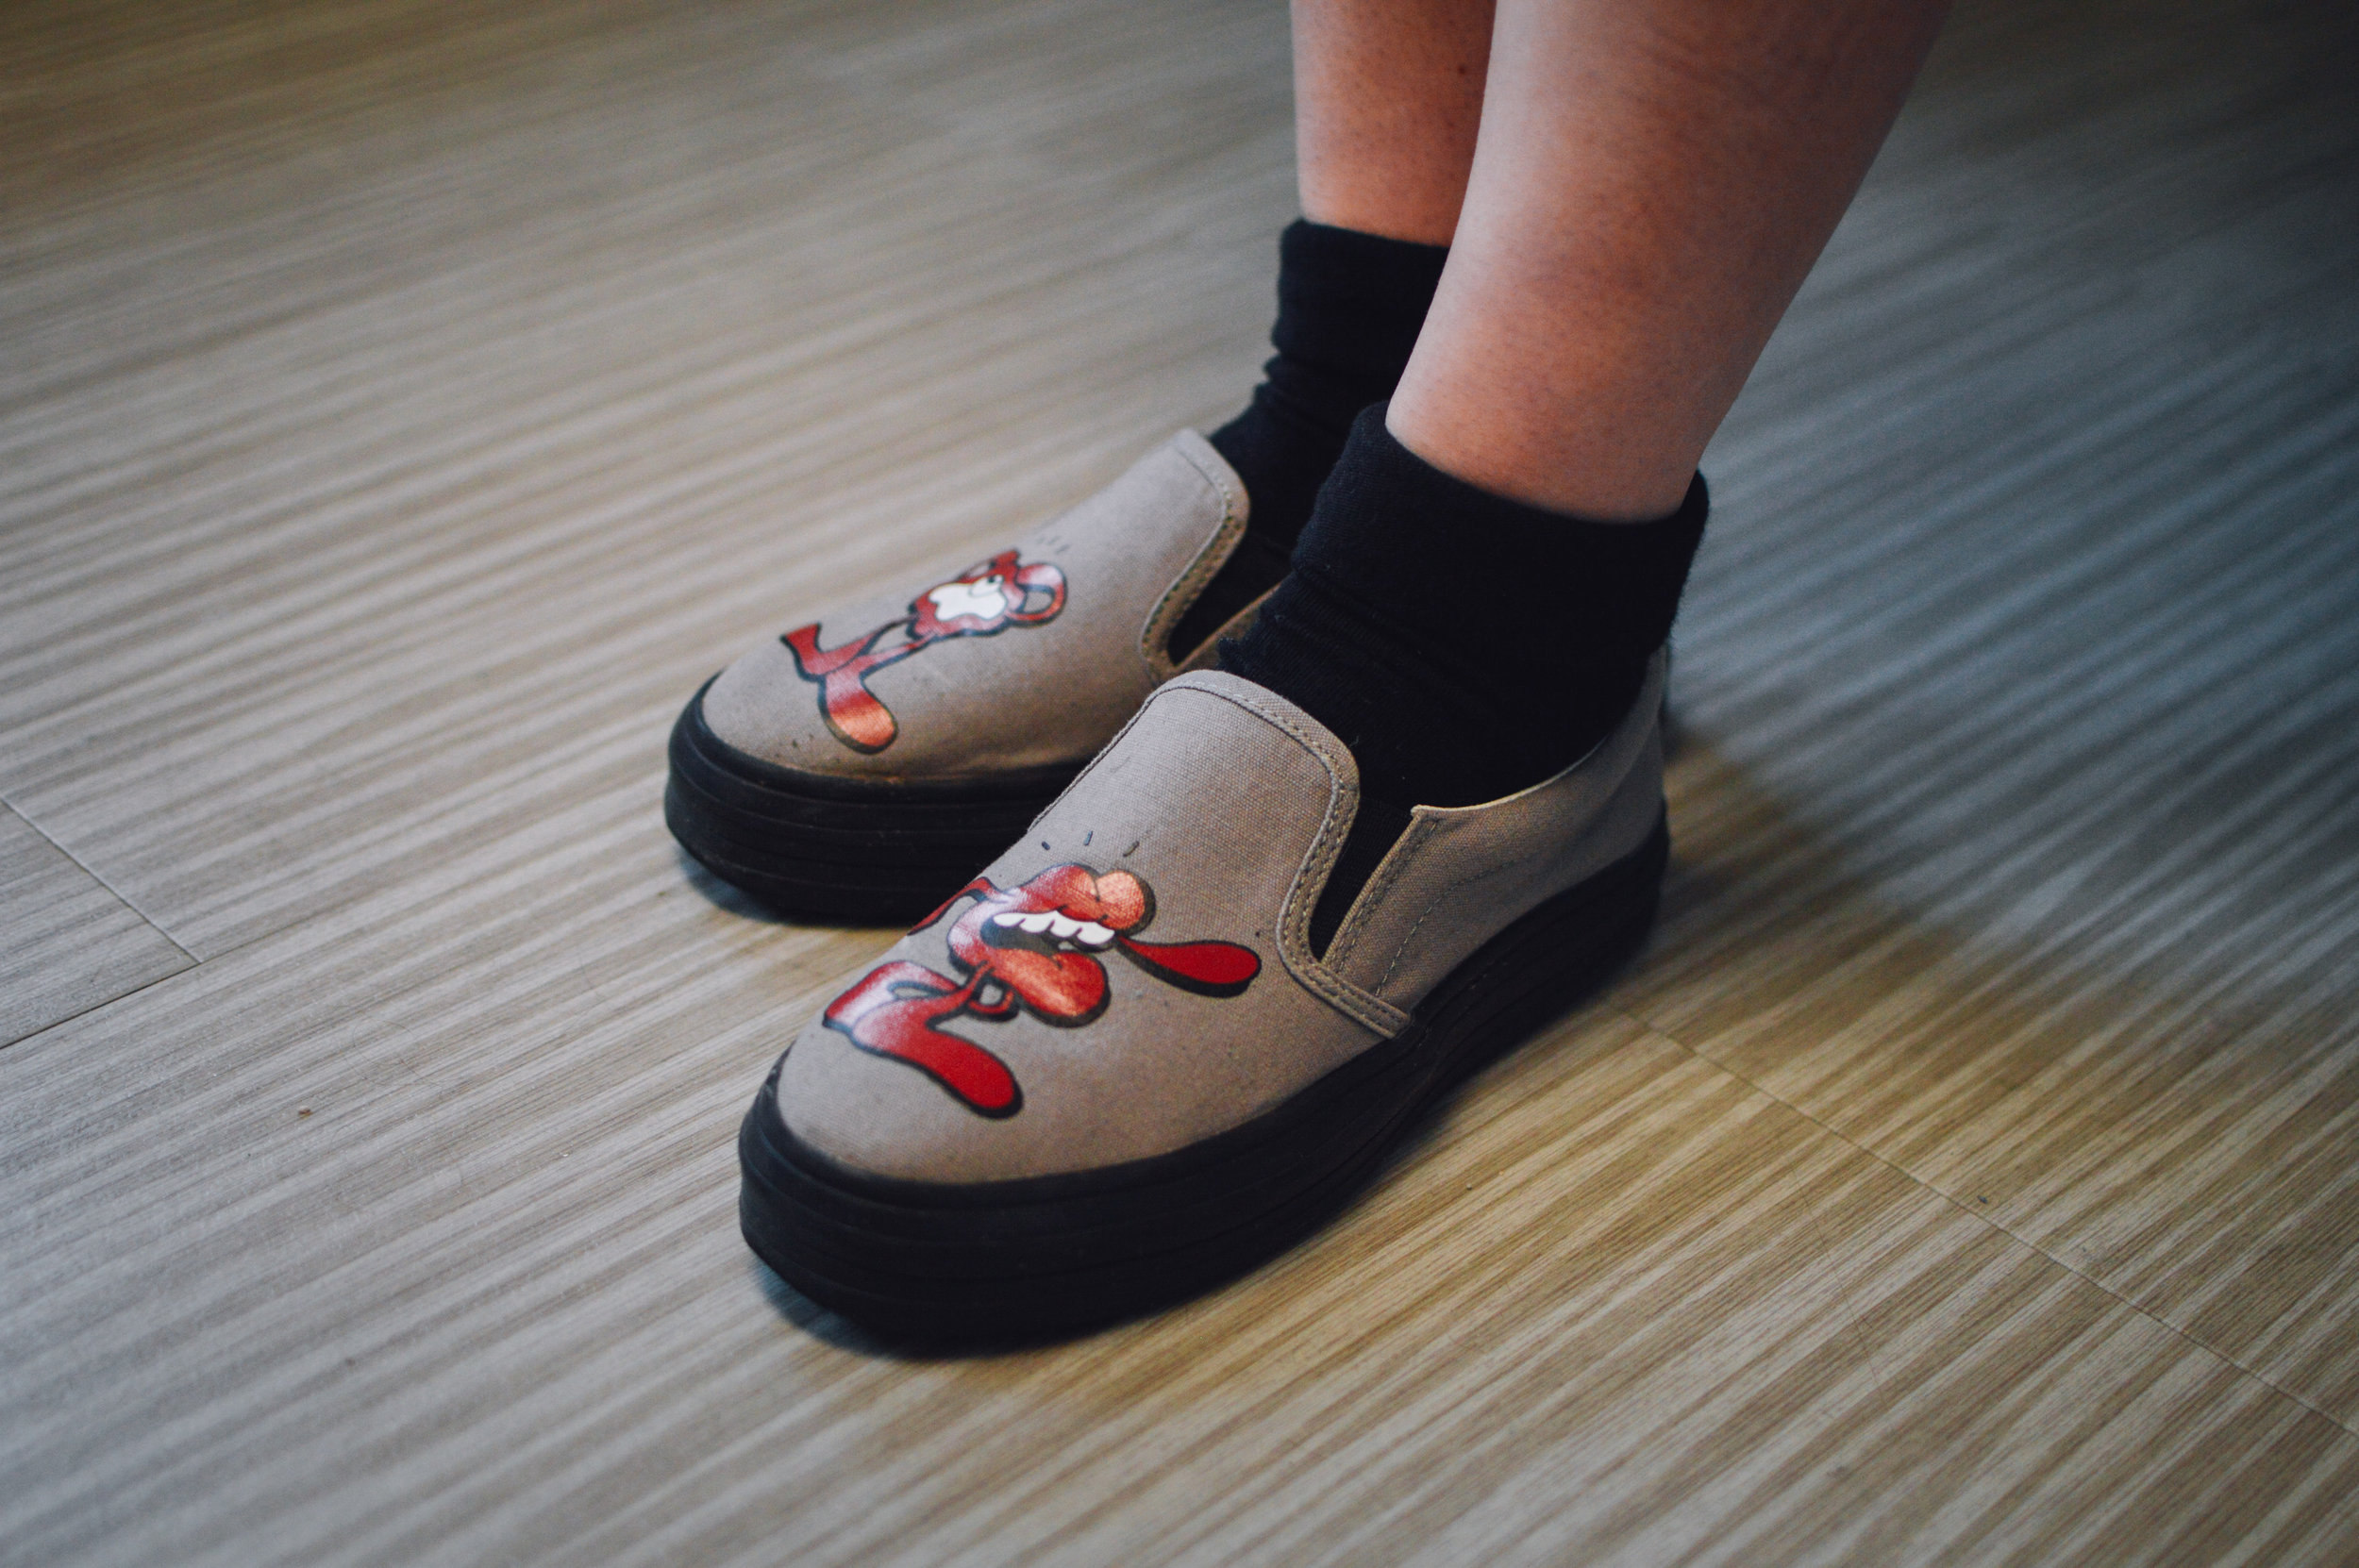 Shoes: YOSH X SWEAR